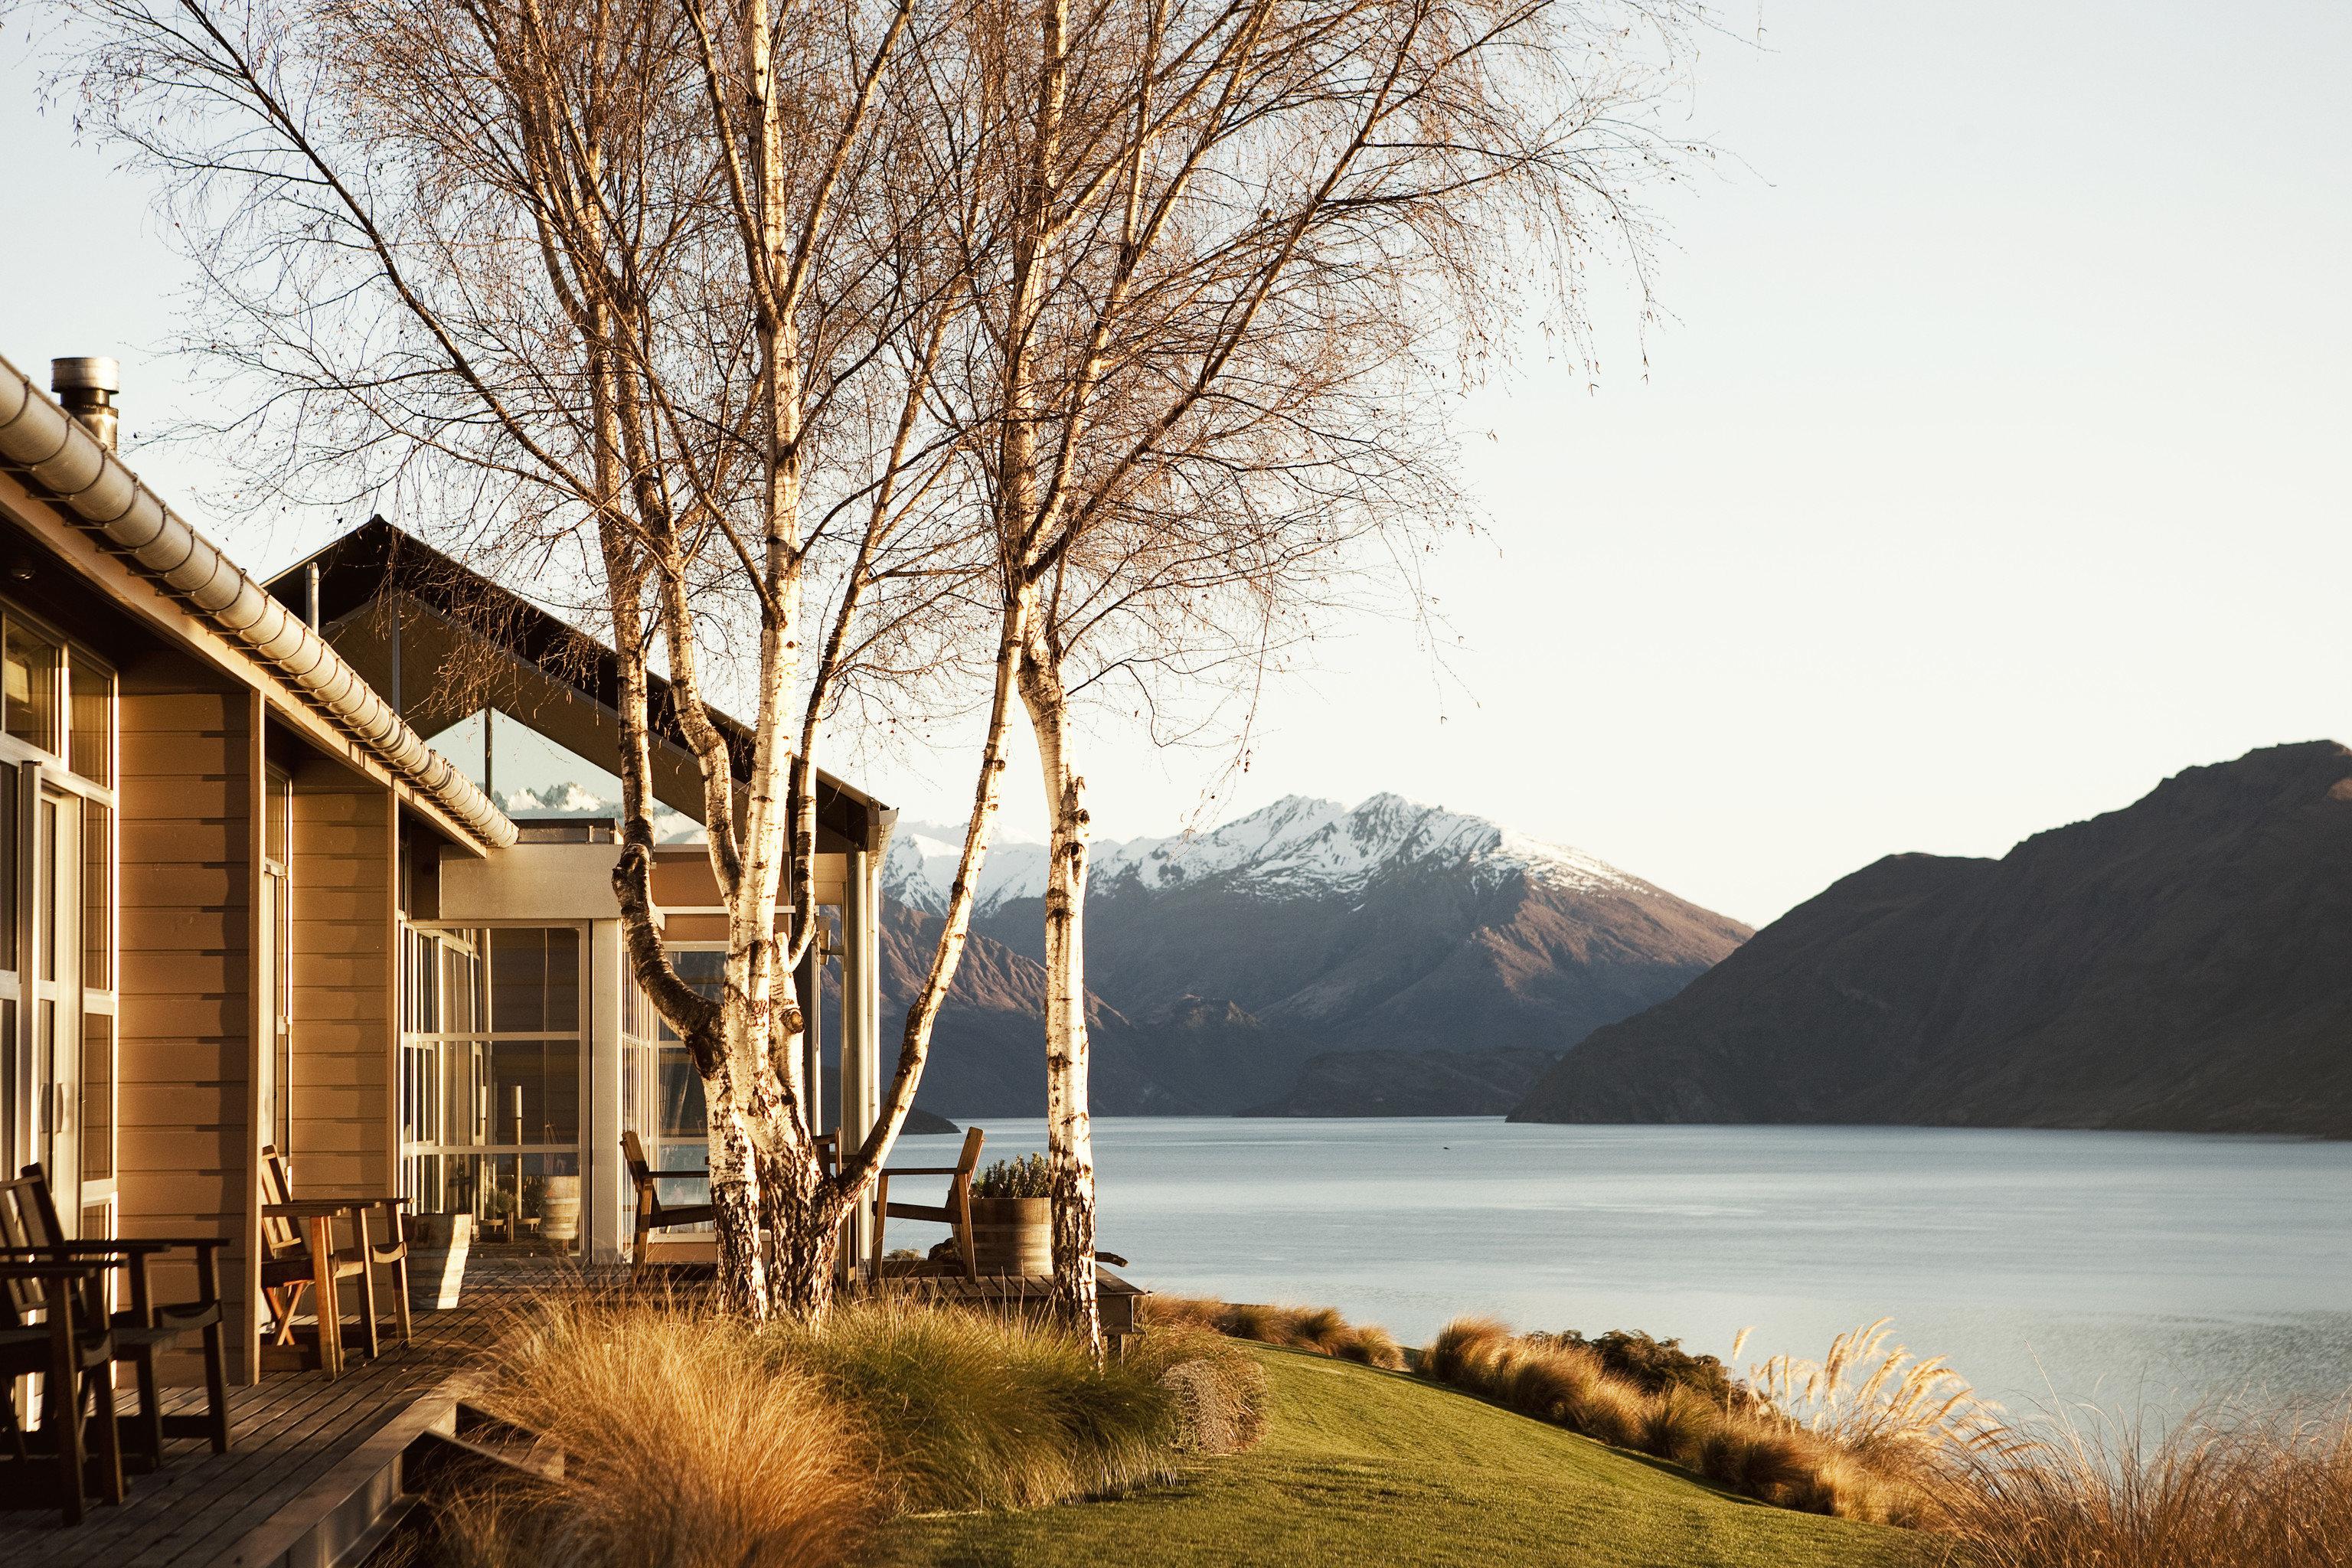 Hotels Luxury Travel Mountains + Skiing sky outdoor tree house mountain morning Winter season Nature evening landscape sunlight